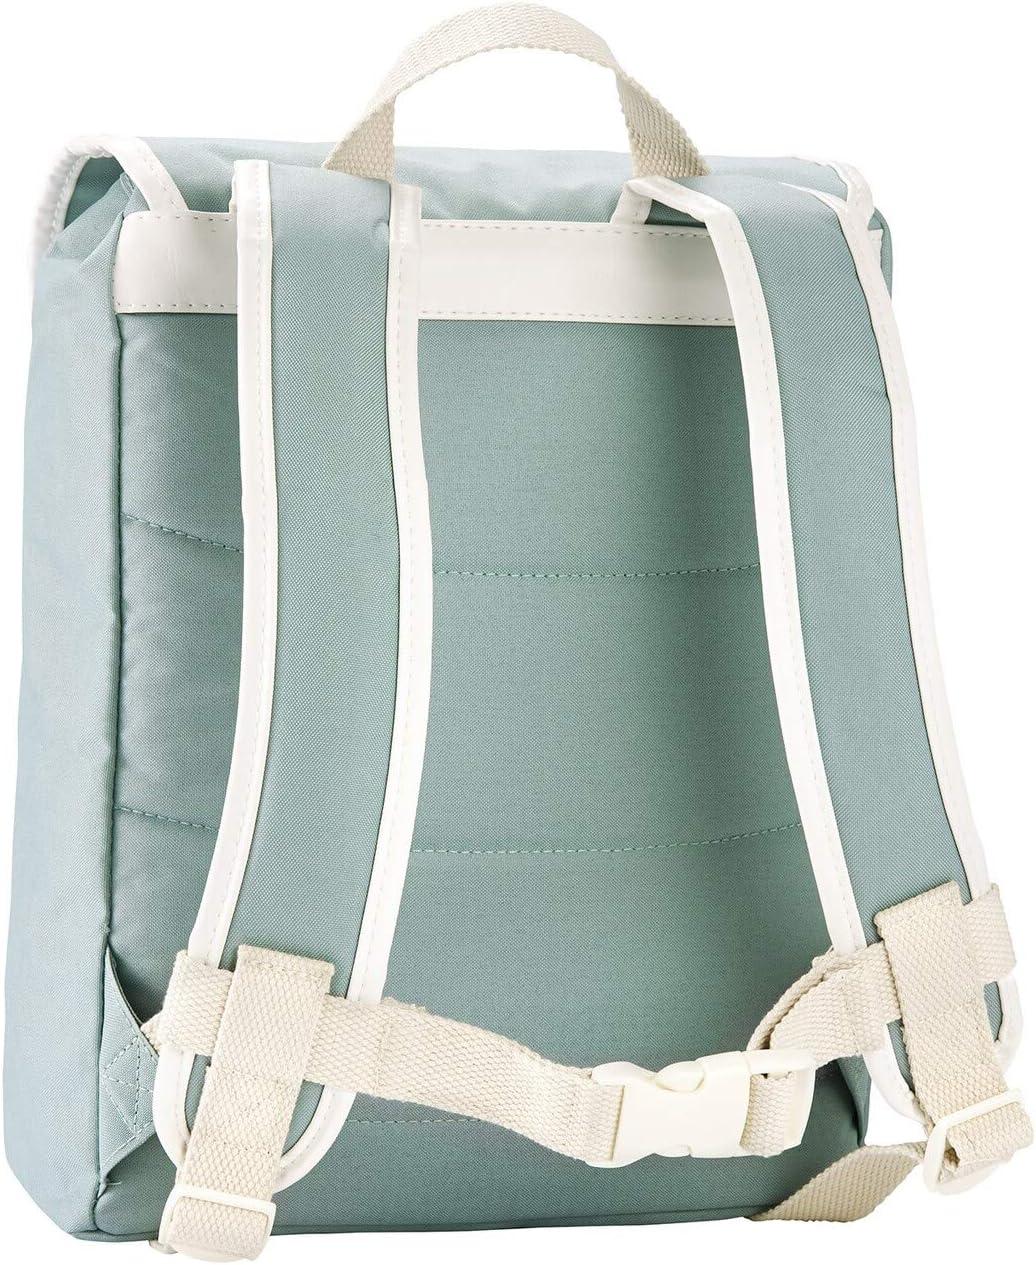 5-10 Years Blafre 2363 Backpack for Kids 12L, Light Blue